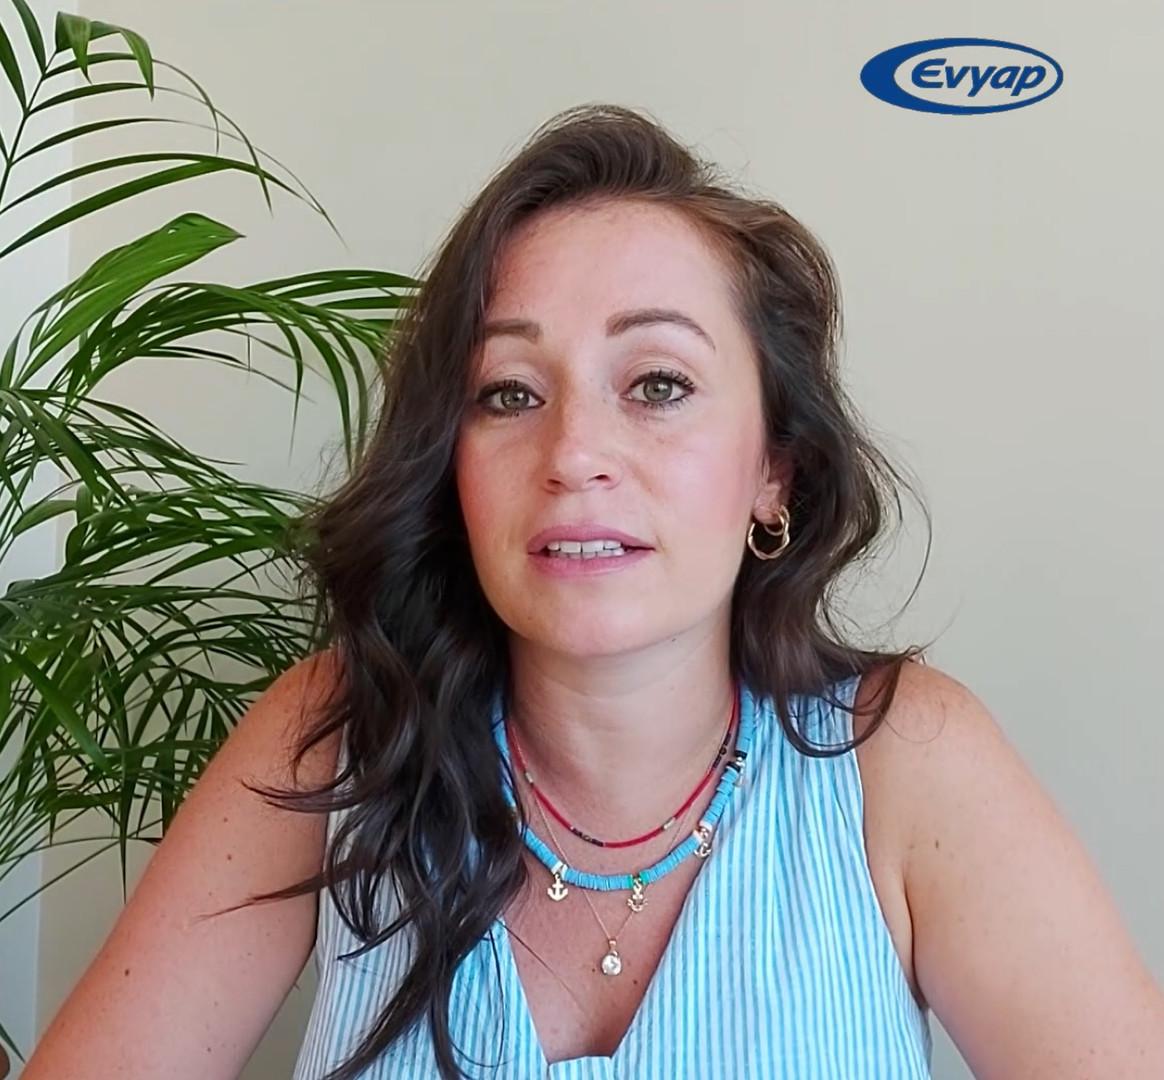 evyap on demand video